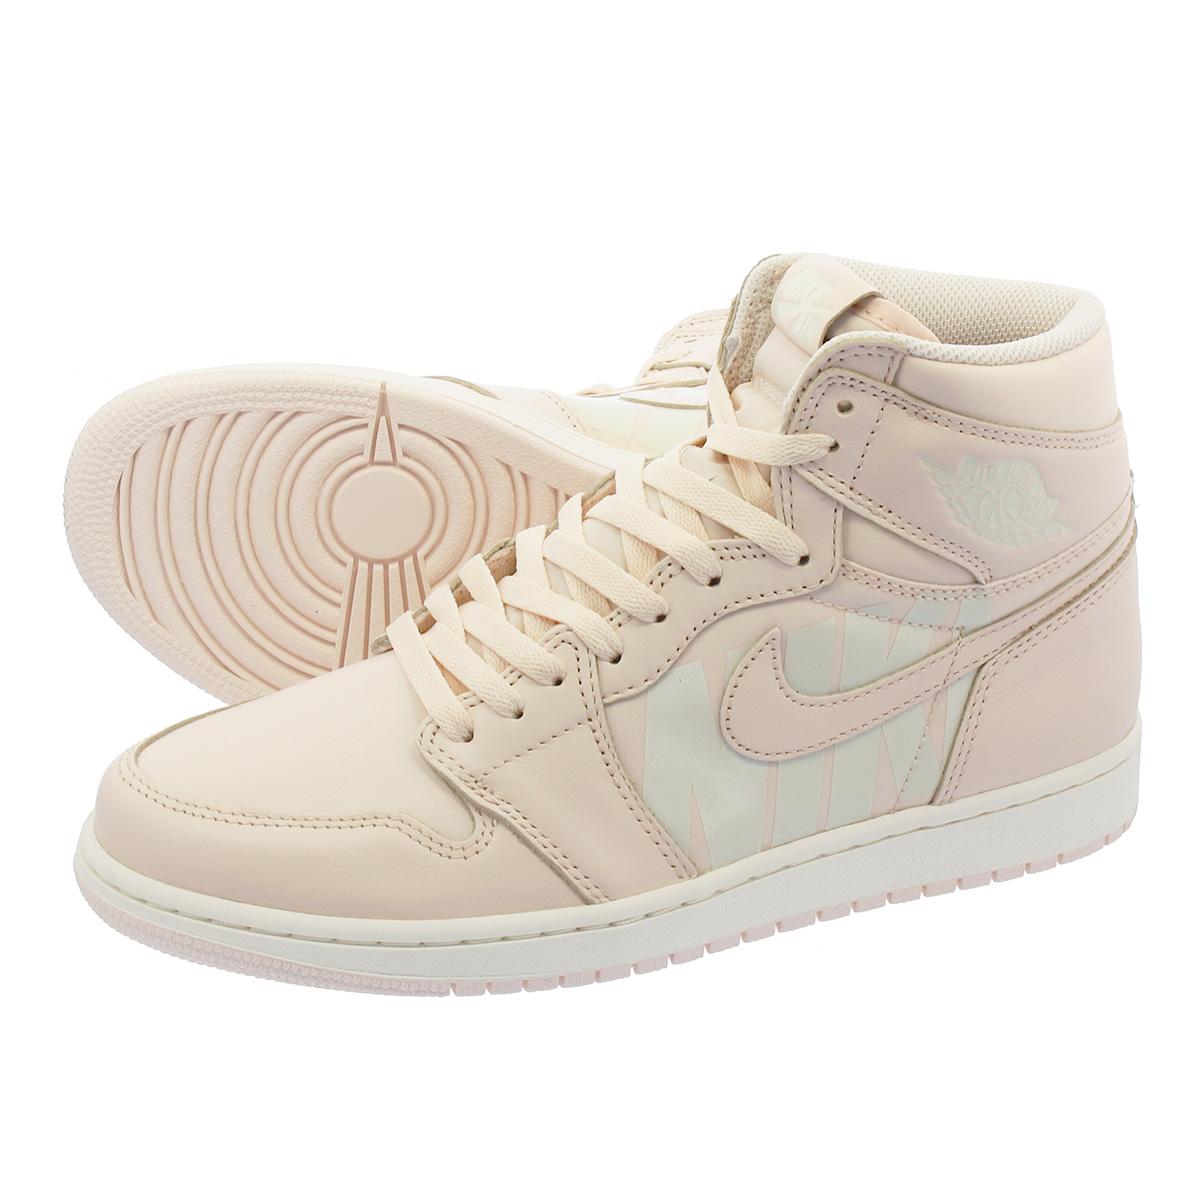 factory price cd246 96817 NIKE AIR JORDAN 1 RETRO HIGH OG Nike Air Jordan 1 nostalgic high OG GUAVA  ICE SAIL 555,088-801